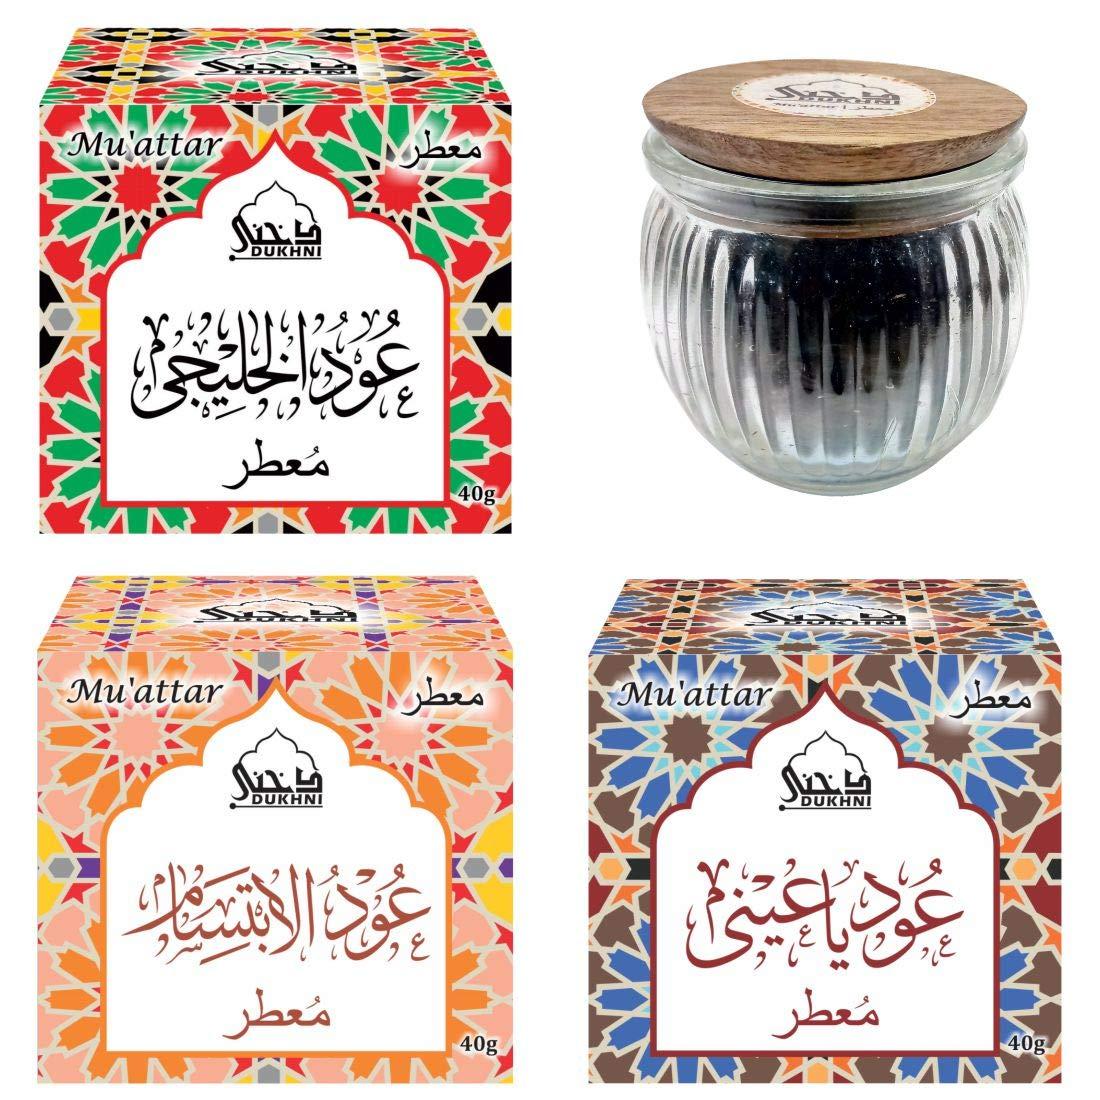 Dukhni Oud Muattar Bakhoor (Set of 3) - Oud Ya Aini, Oud Al Khaleeji, Oud Al Ibtisam